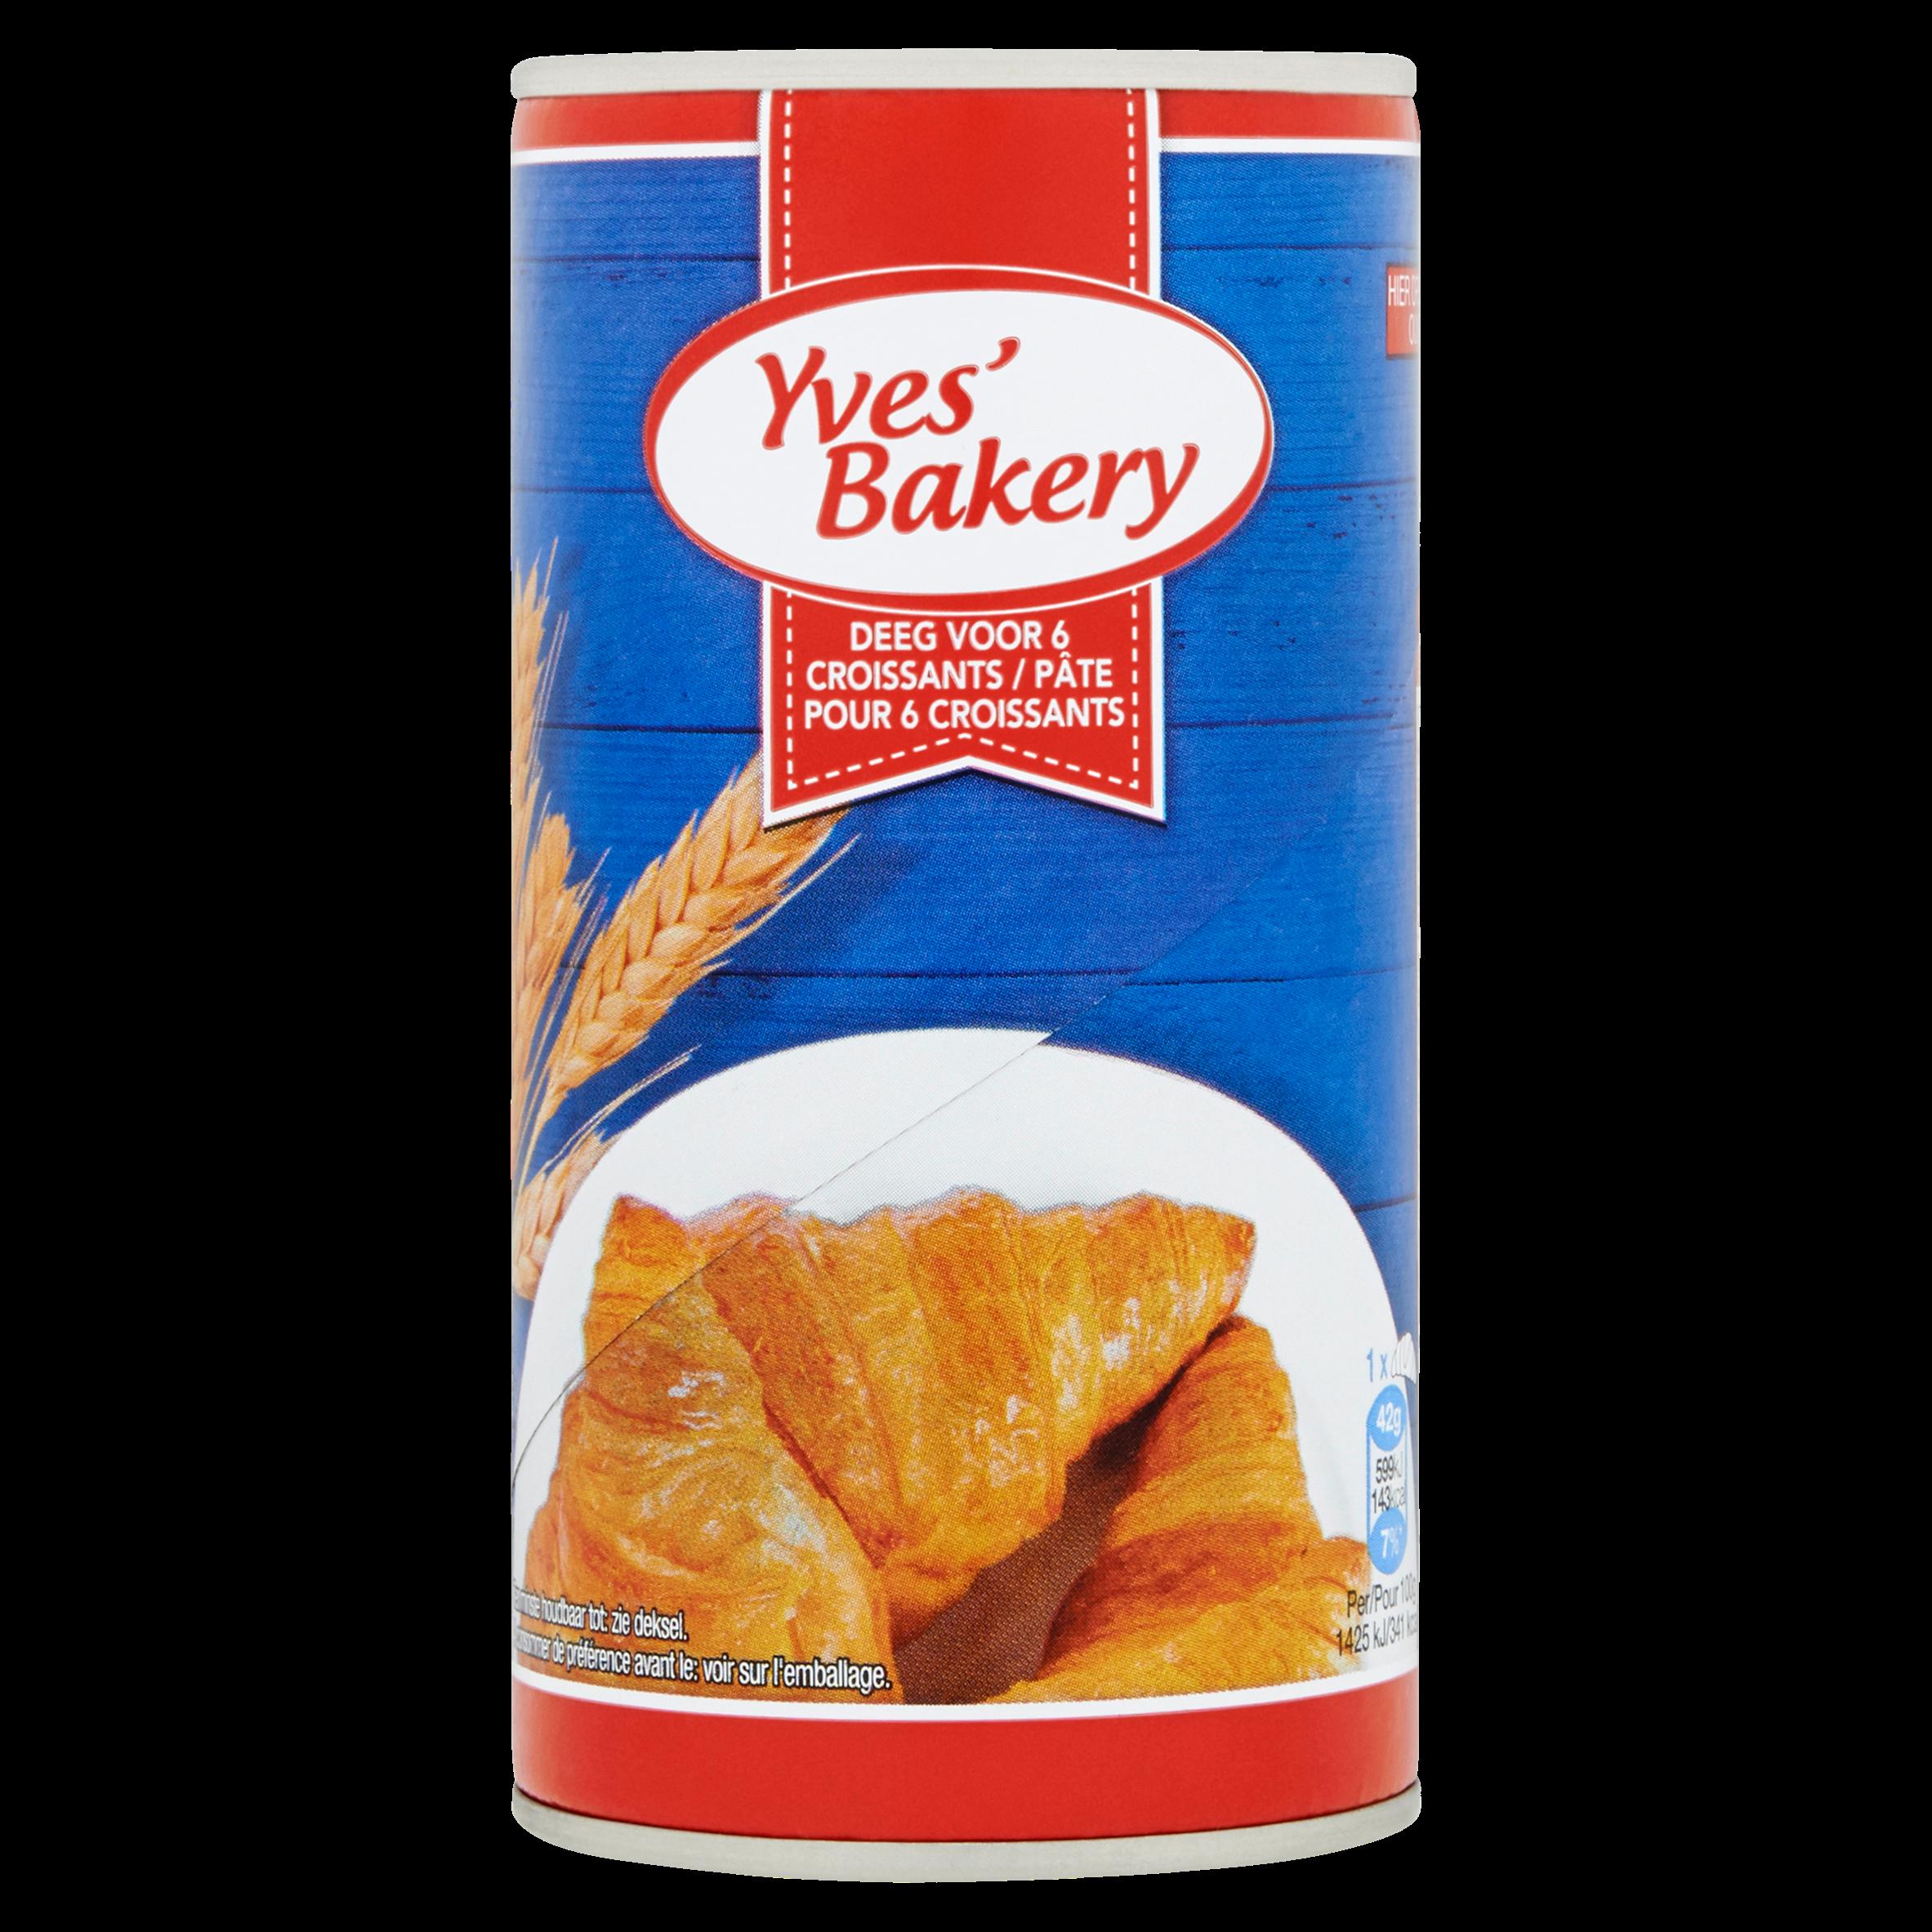 Yves' Bakery Deeg voor 6 Croissants 250 g